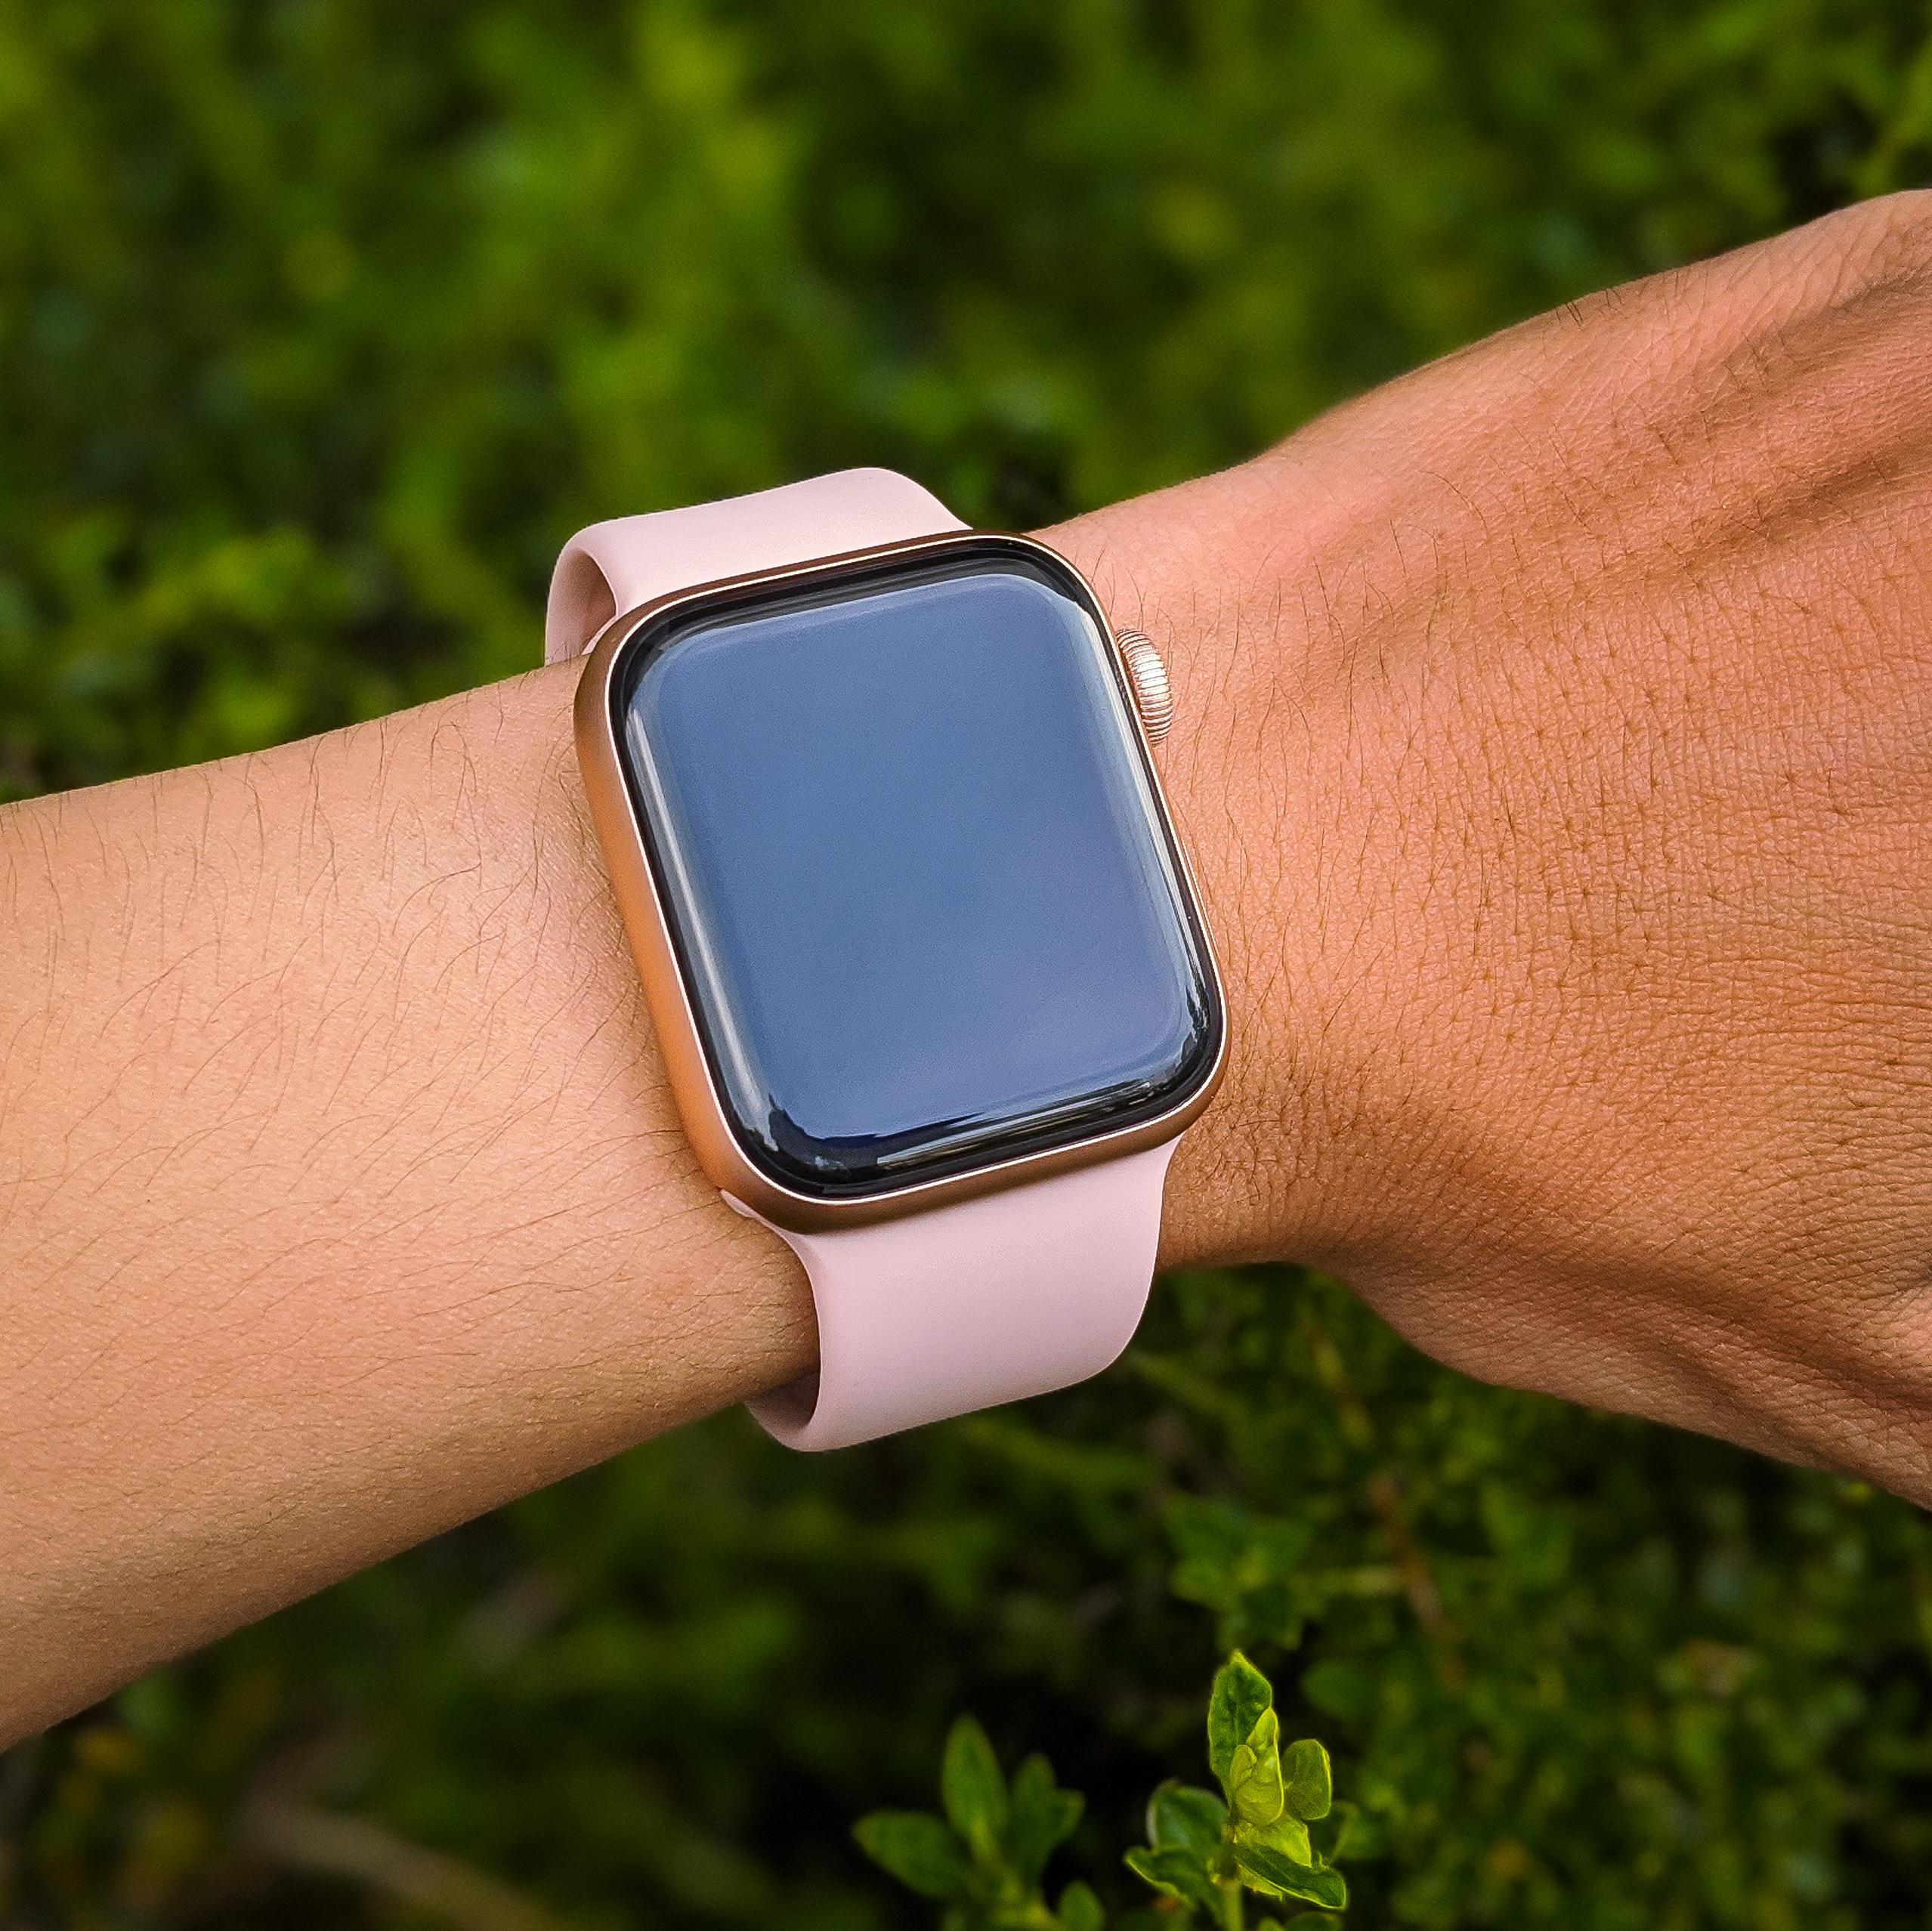 Cận cảnh Apple Watch Series 4 (40mm) Bản CPO eSim